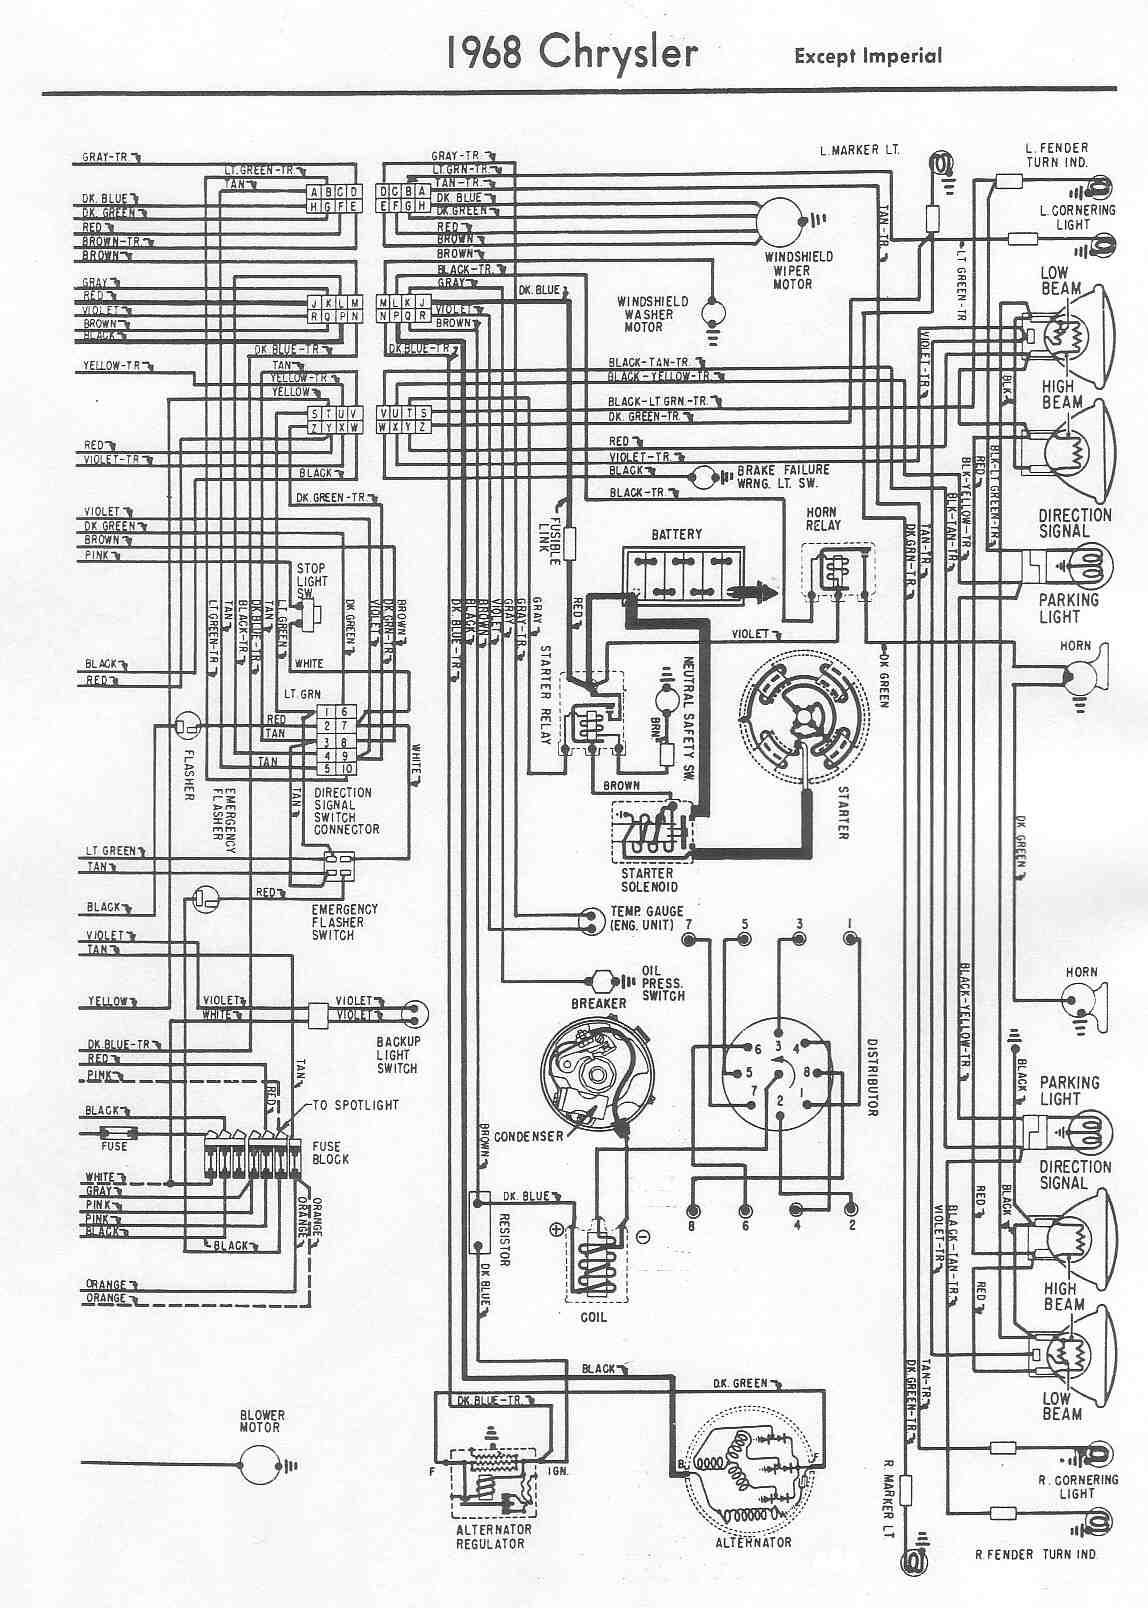 small resolution of 1966 gto wiper wiring diagram schematic wiring diagrams lol 65 gto wiring diagram schematic 1966 gto wiper wiring diagram schematic